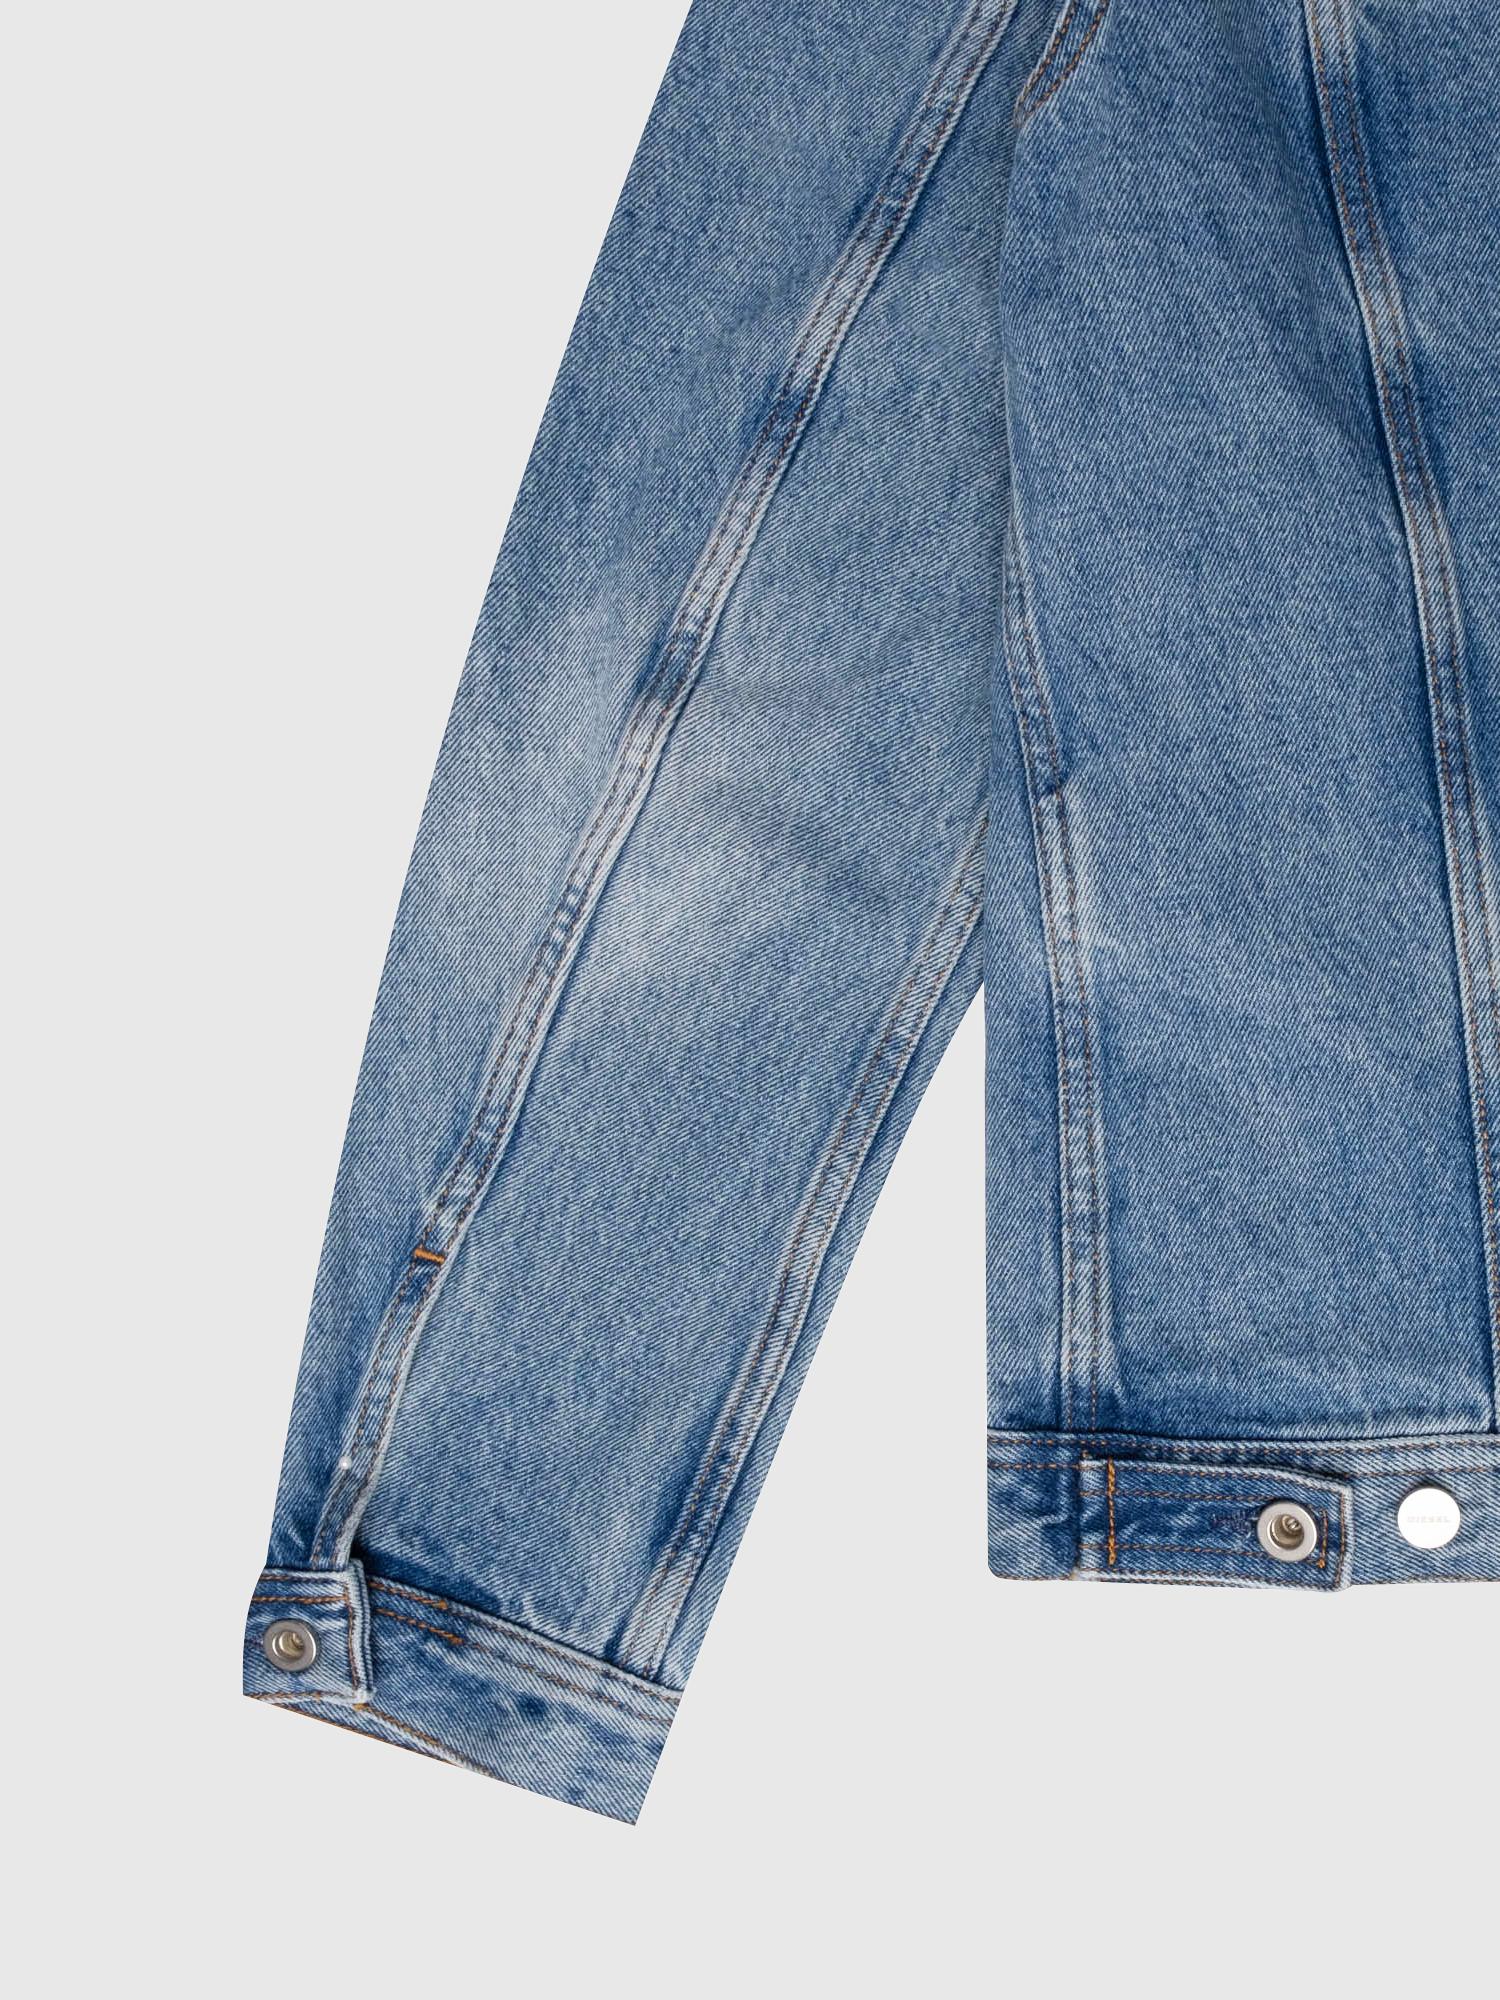 Diesel - US-NHILL-POP1, Medium blue - Denim Jackets - Image 4